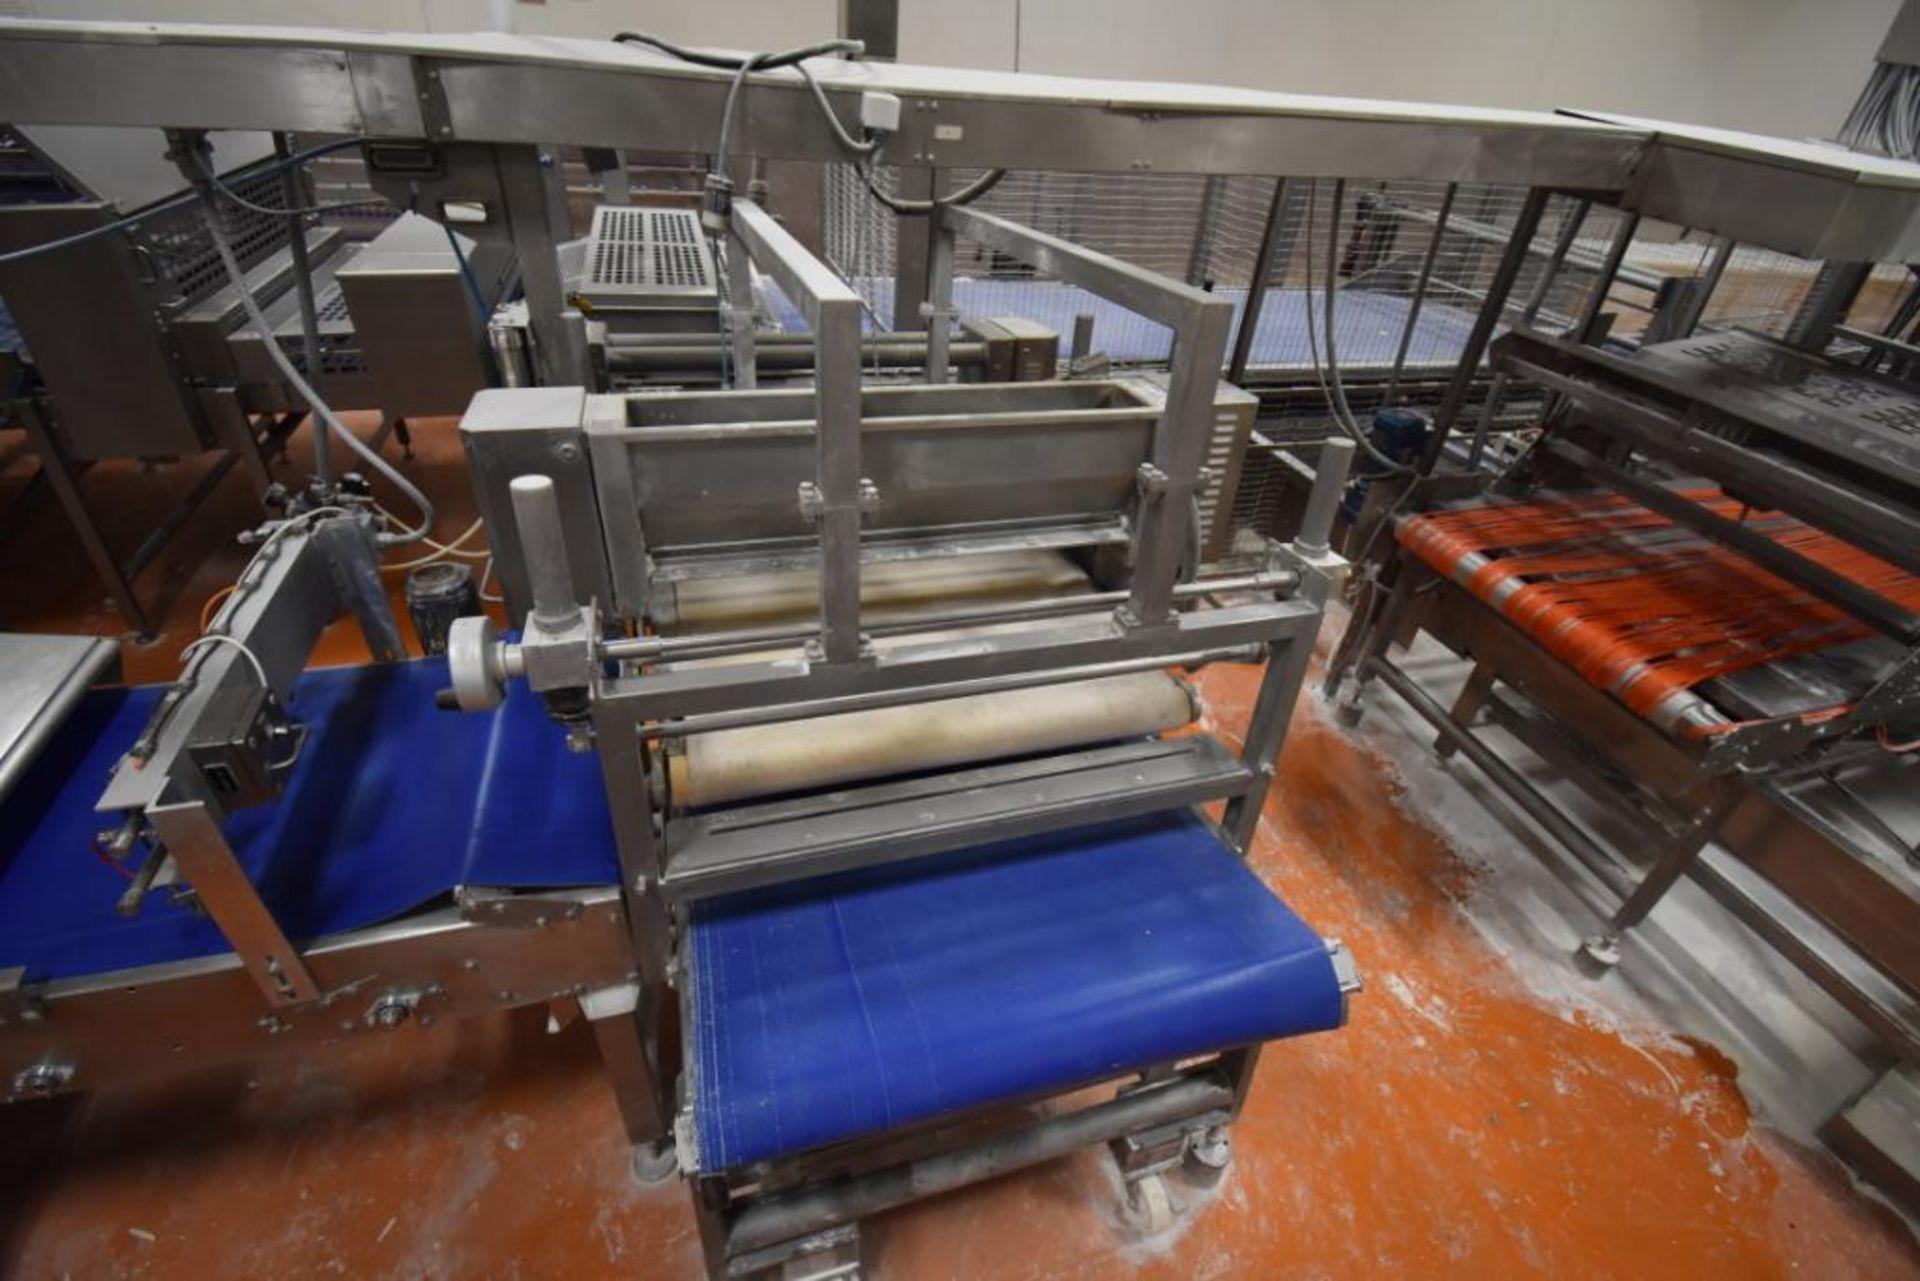 2007 Fritsch Laminator 3000 dough line - Image 274 of 280